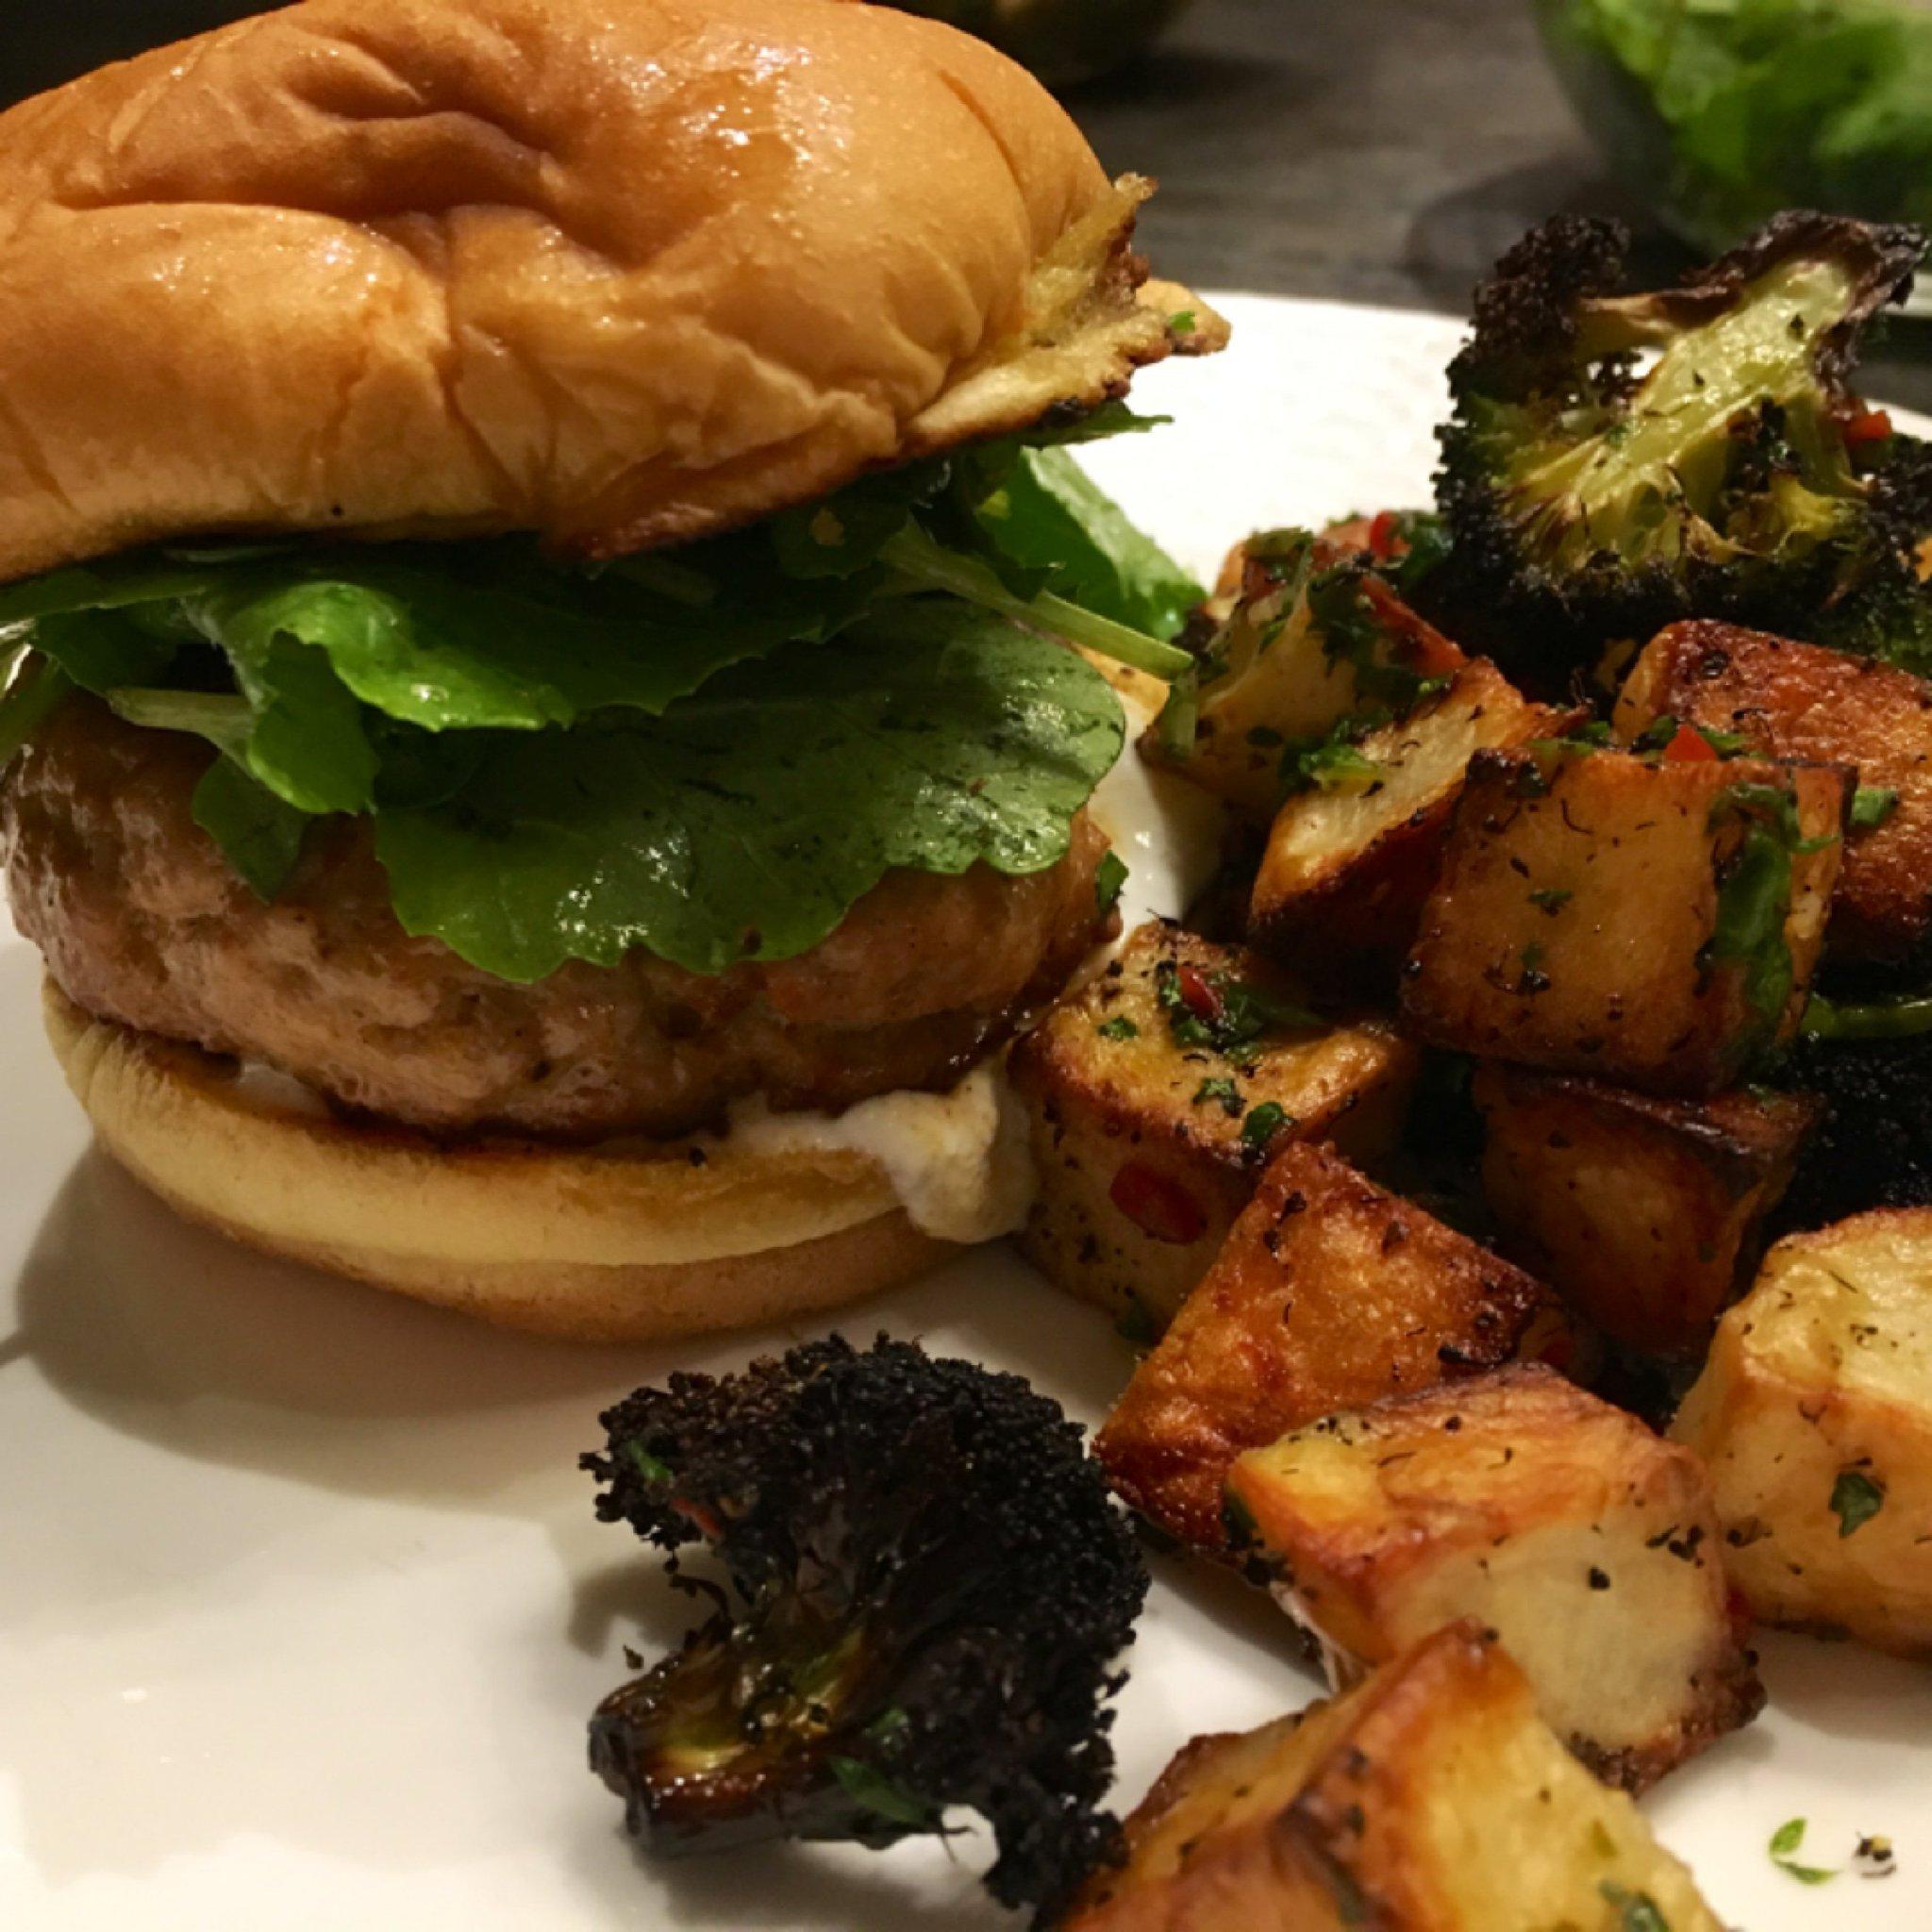 Blue apron pork burgers - Matt Salzberg On Twitter Smoky Pork Burgers With Roasted Vegetables Piquillo Pepper Sauce Blueapron Https T Co Y9zkcitdv2